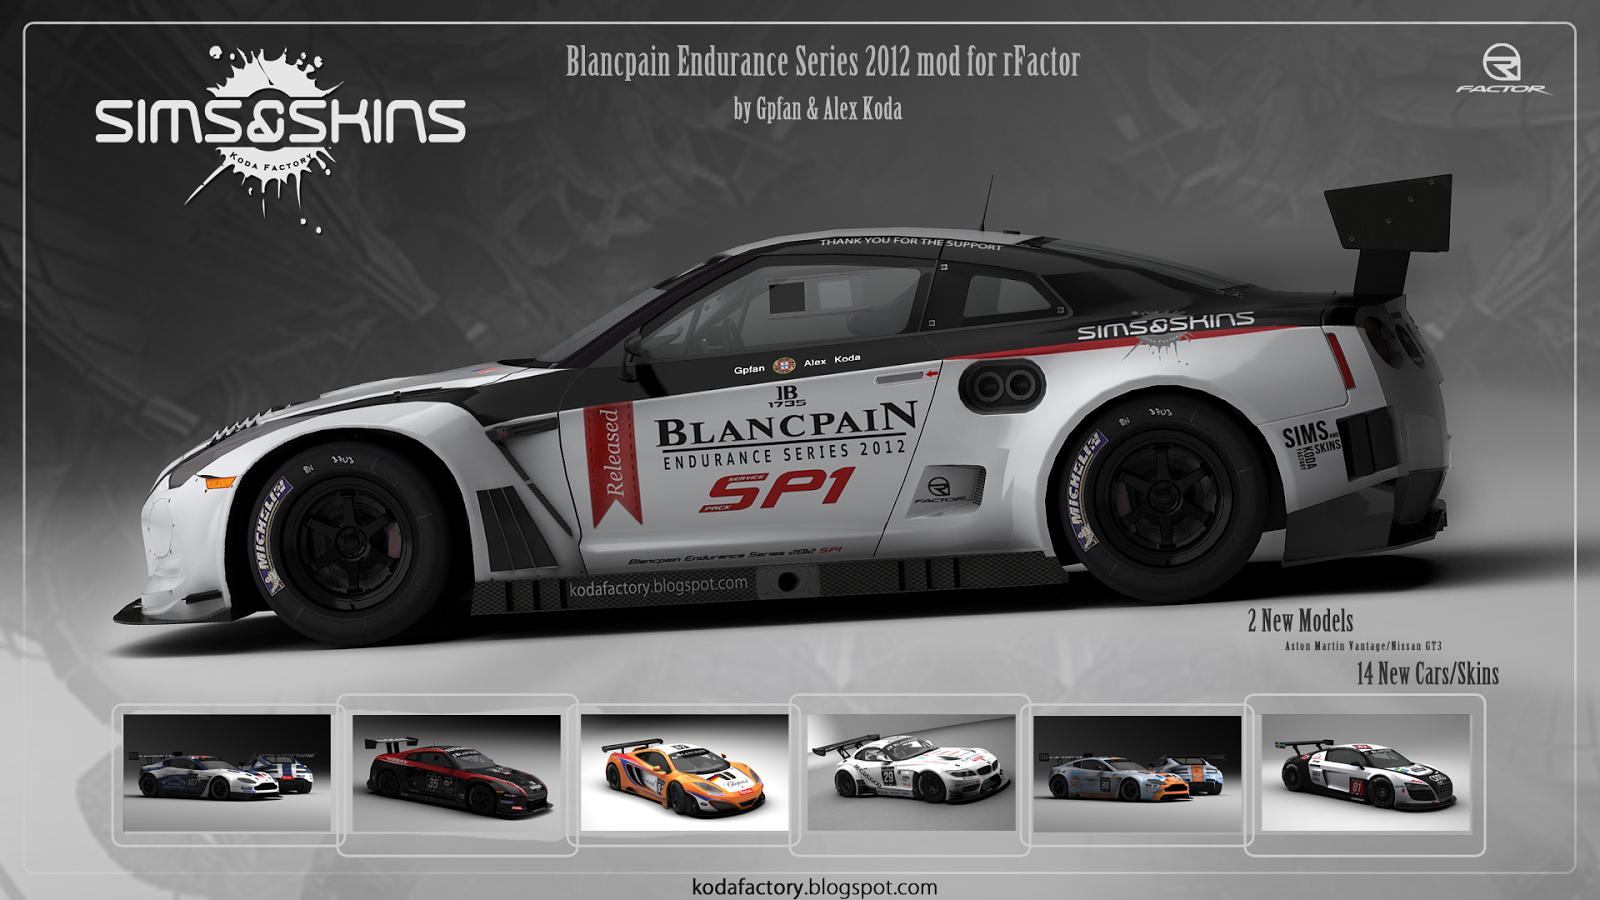 Blancpain Endurance Series #